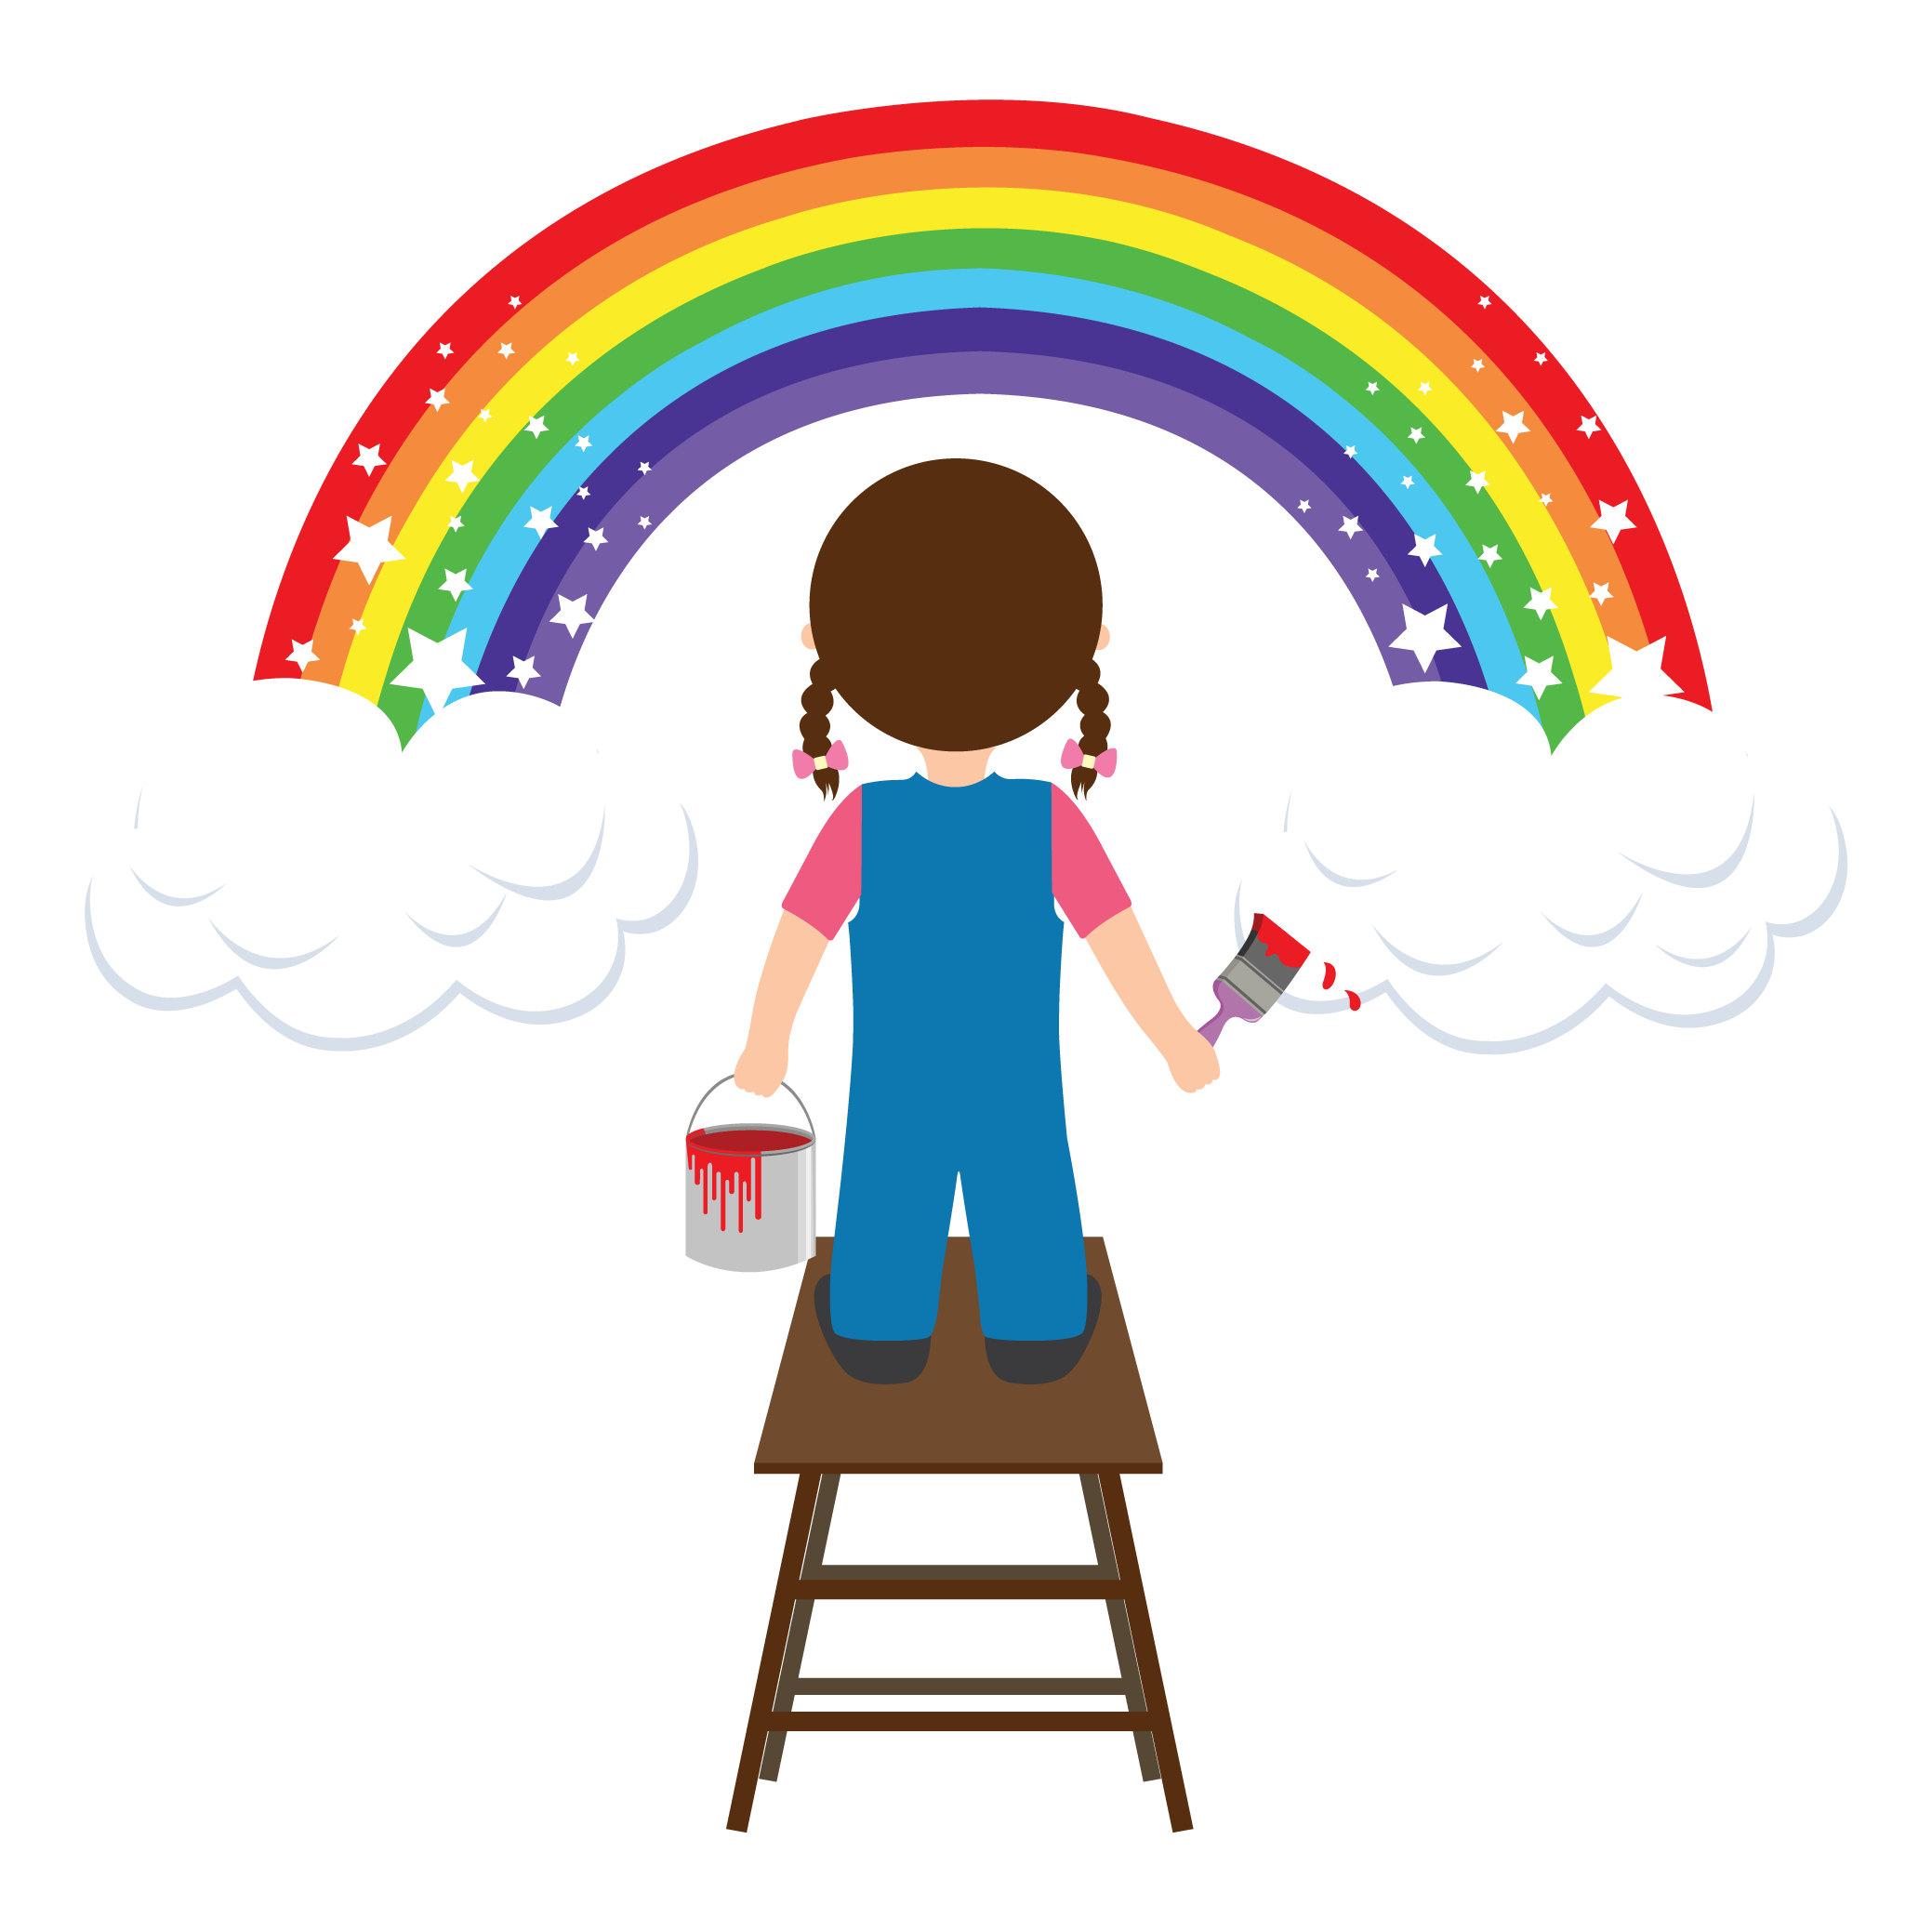 2078x2078 Lego Clipart Lego Bricks Clip Art Colorful Legos Rainbow